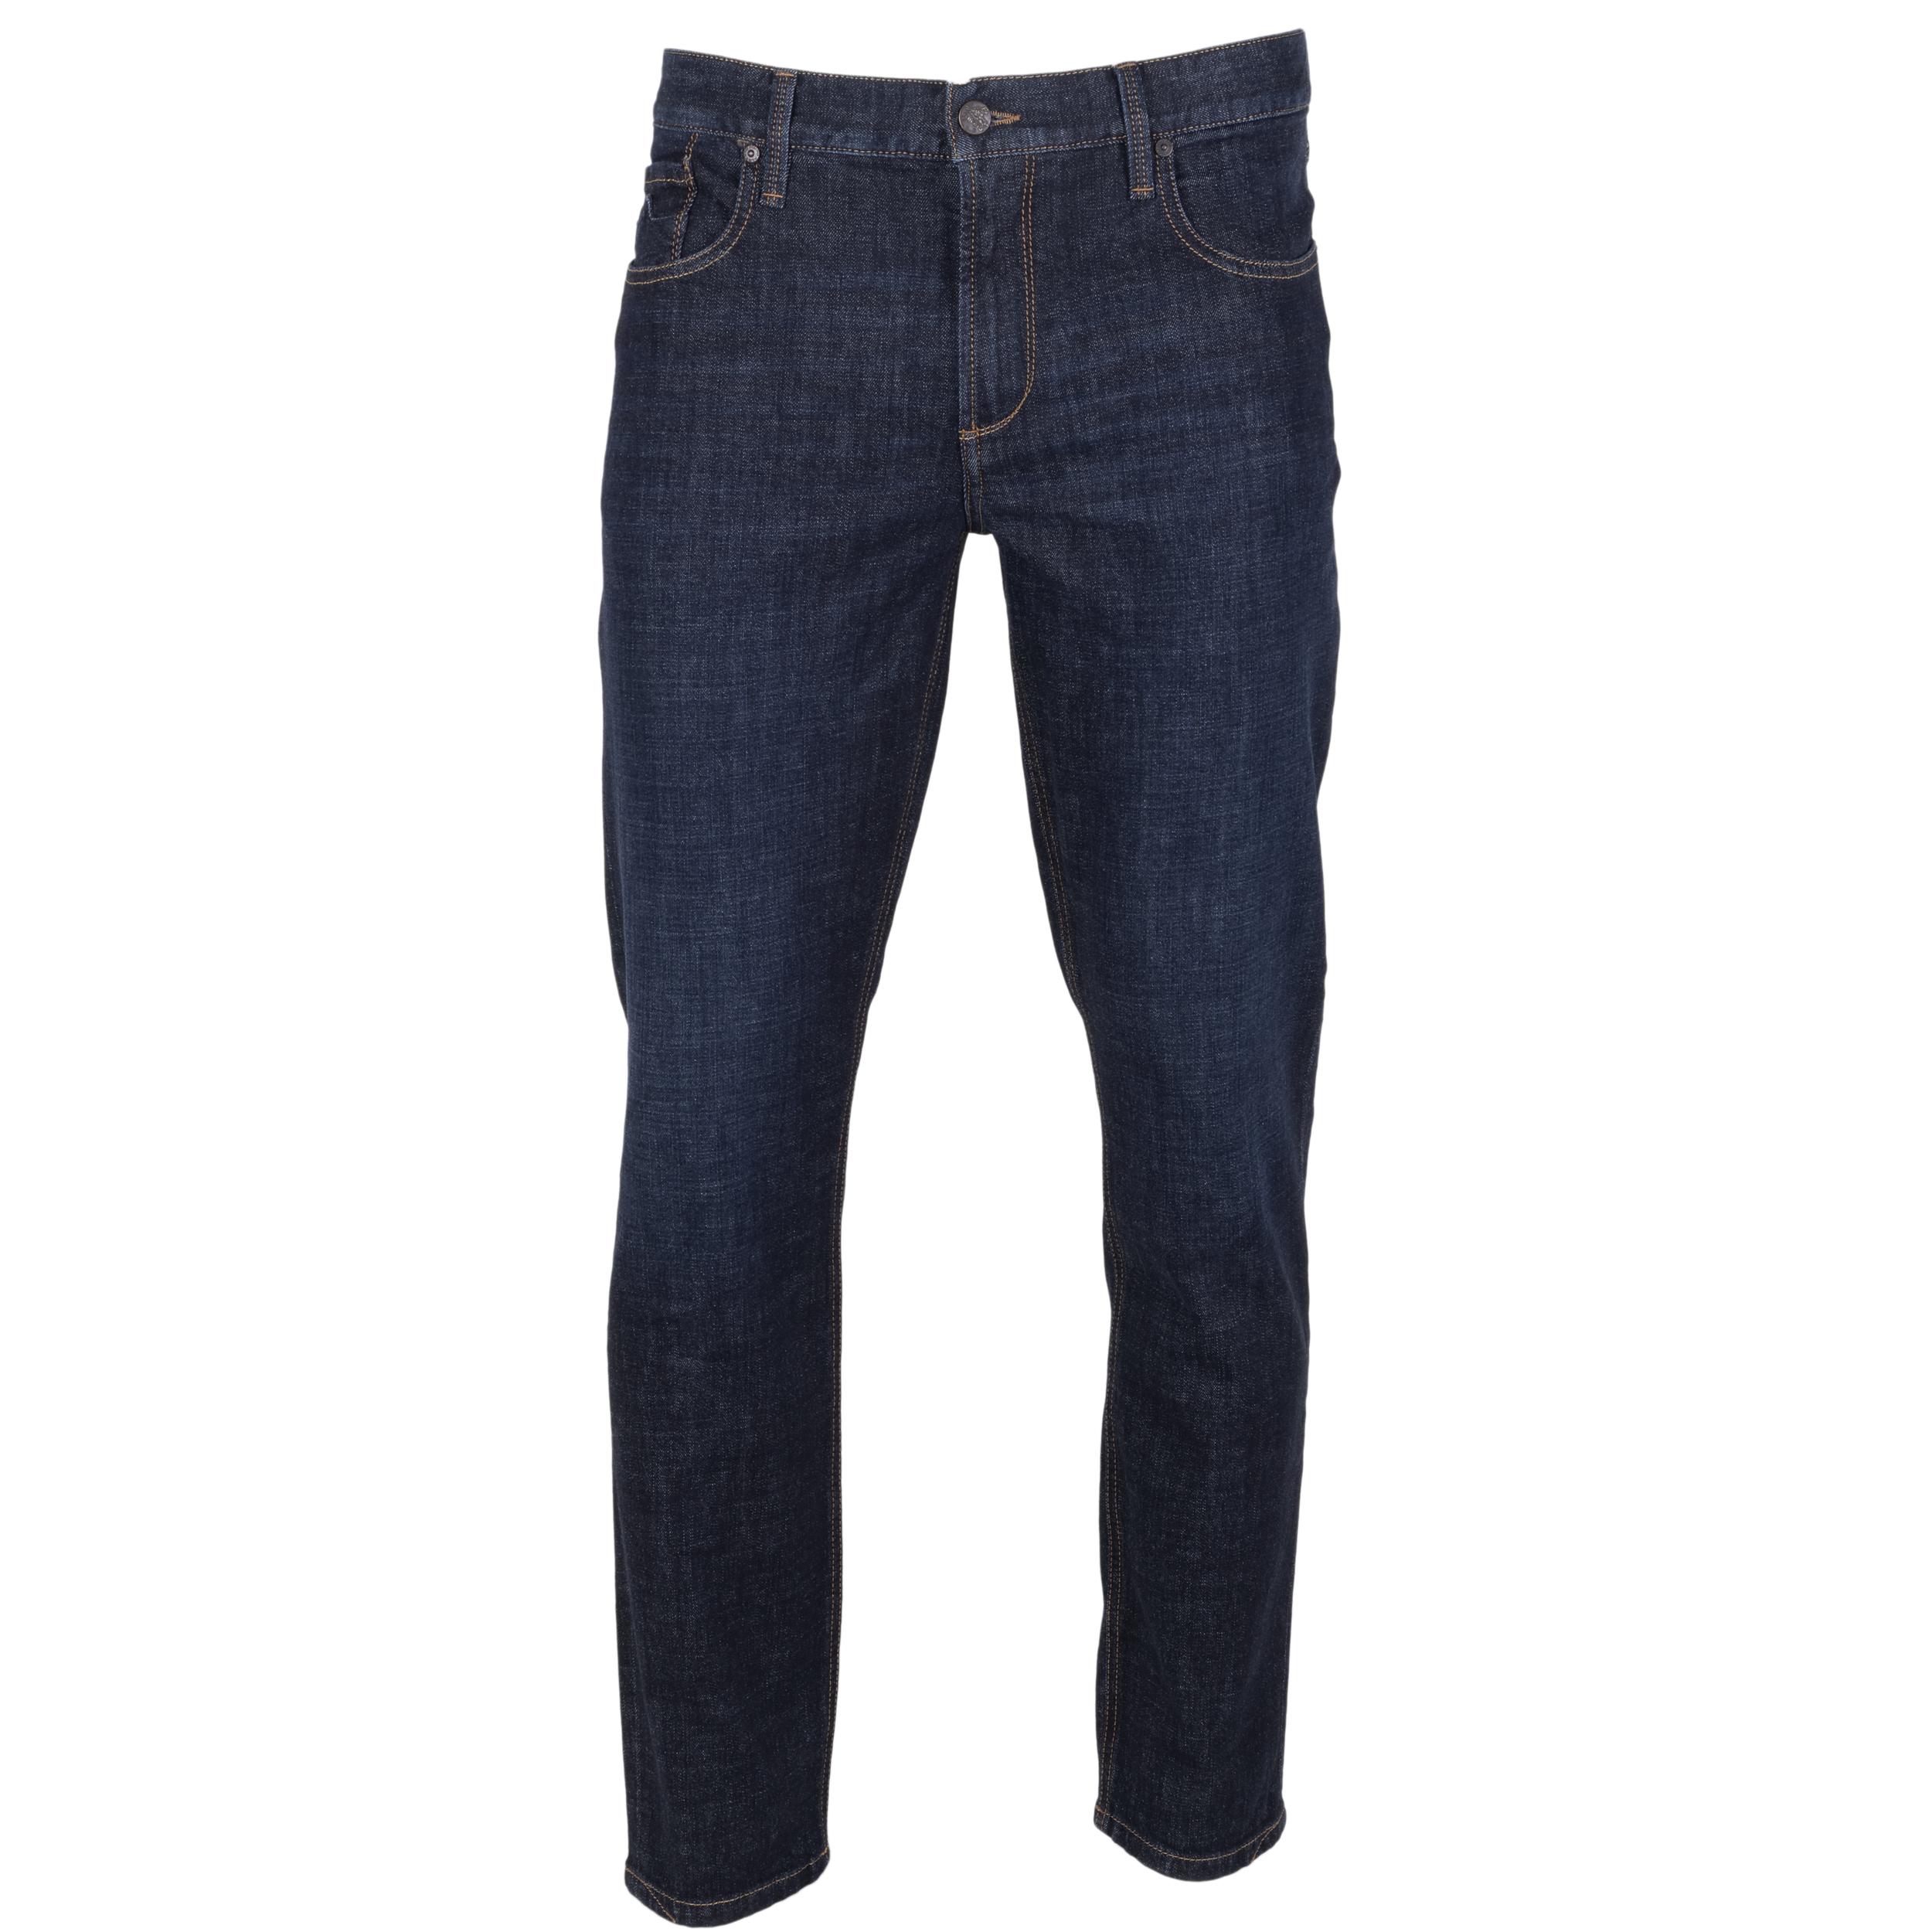 Alberto Herren Jeans Slipe tapered - navy 36/34